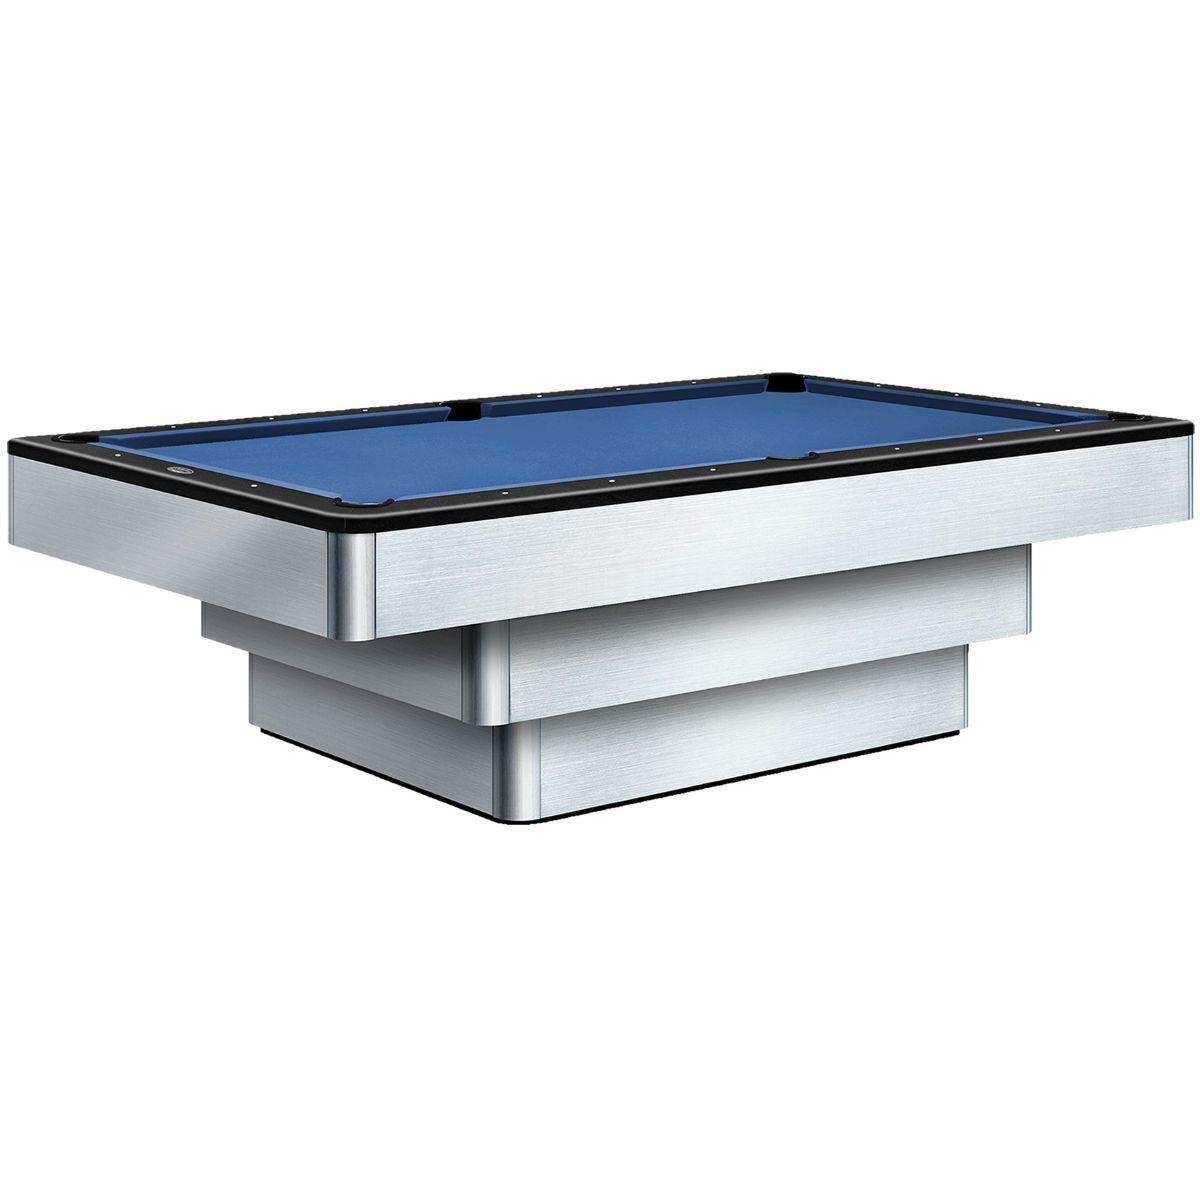 Olhausen - Pool Table - Maxim